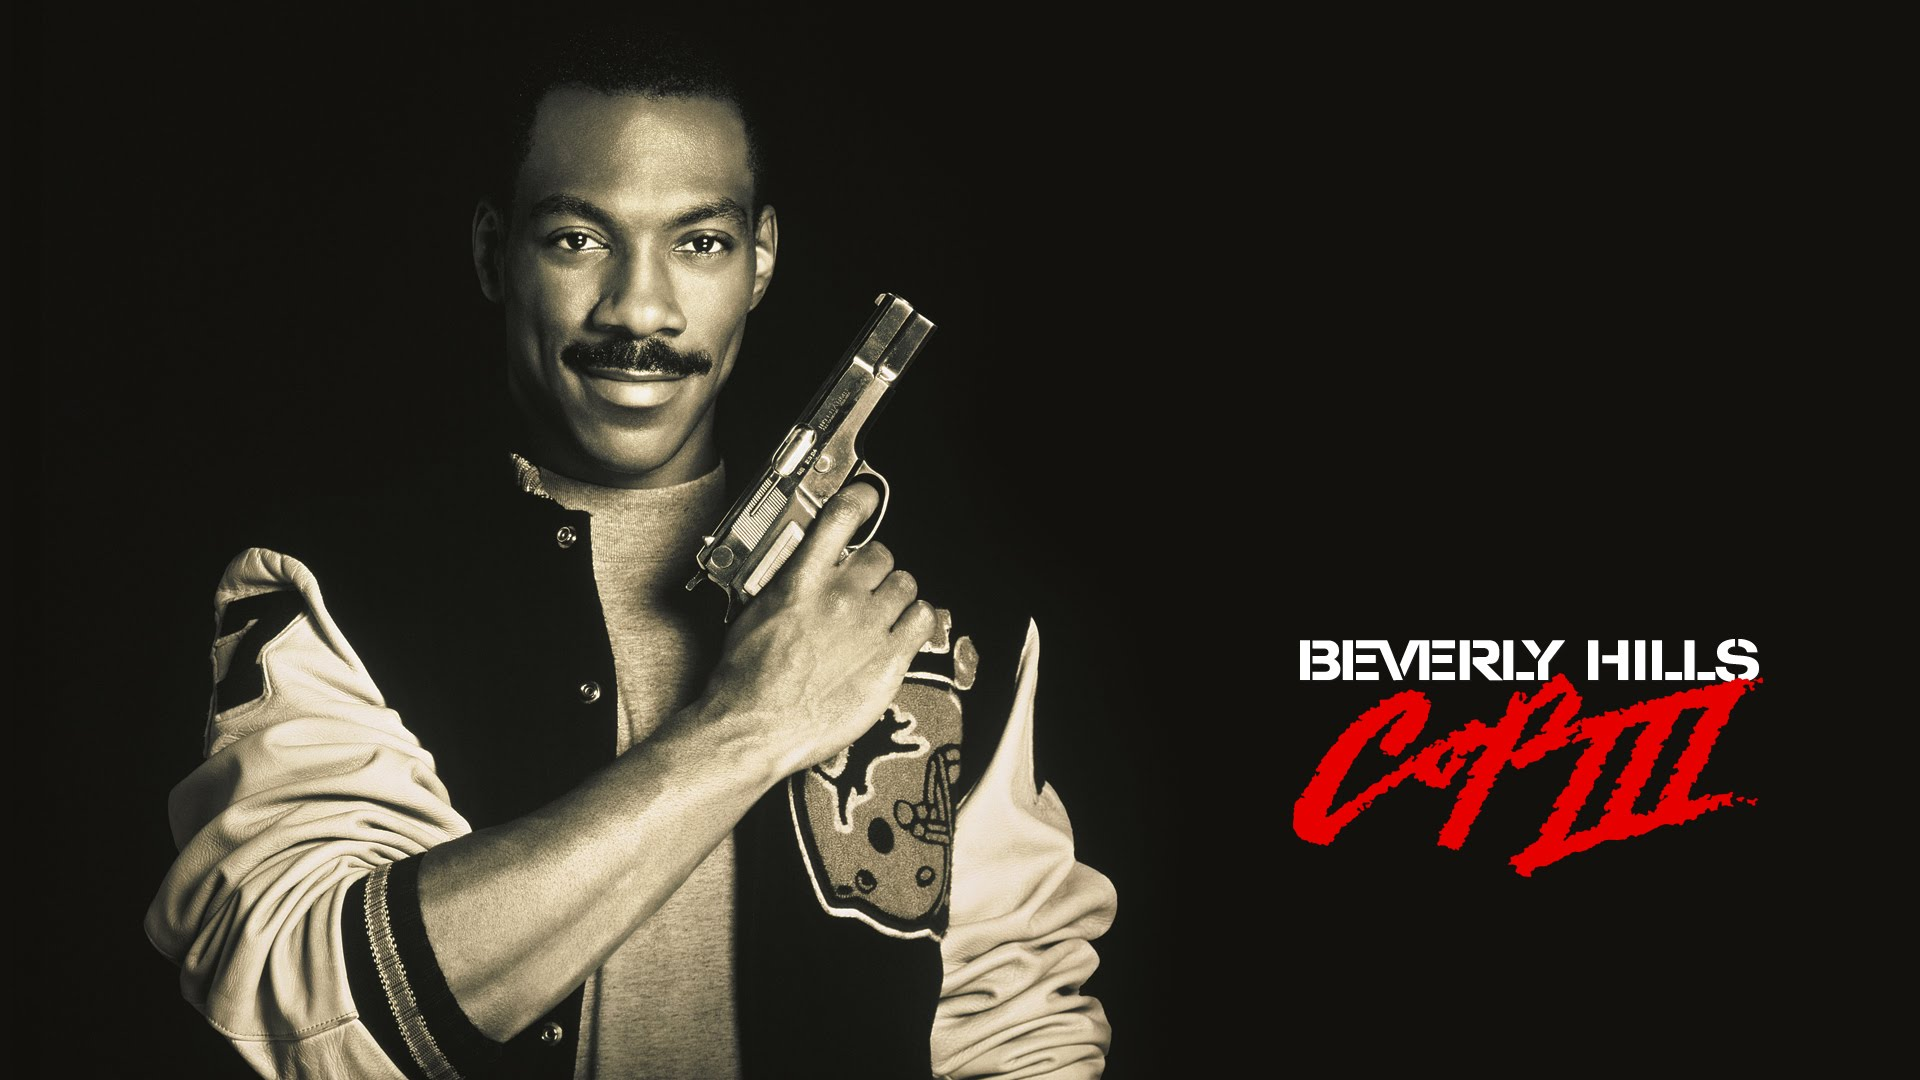 Beverly Hills Cop III Backgrounds on Wallpapers Vista